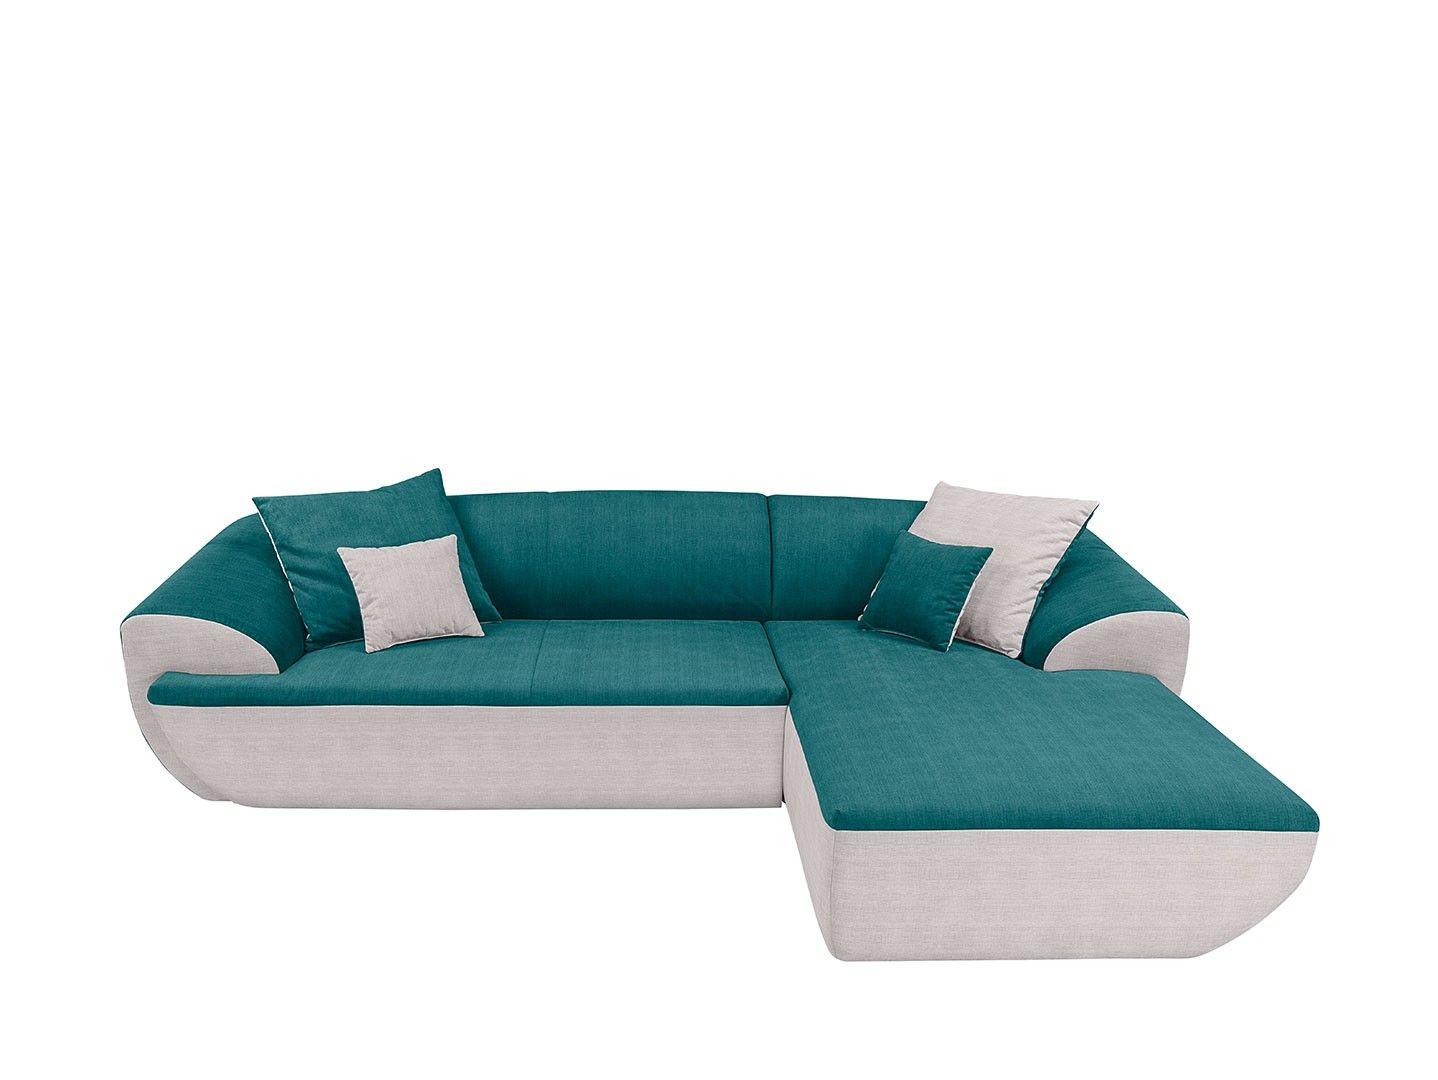 Coltare Canapele.Coltar Przemek Iv Apartment Couch Home Decor Furniture